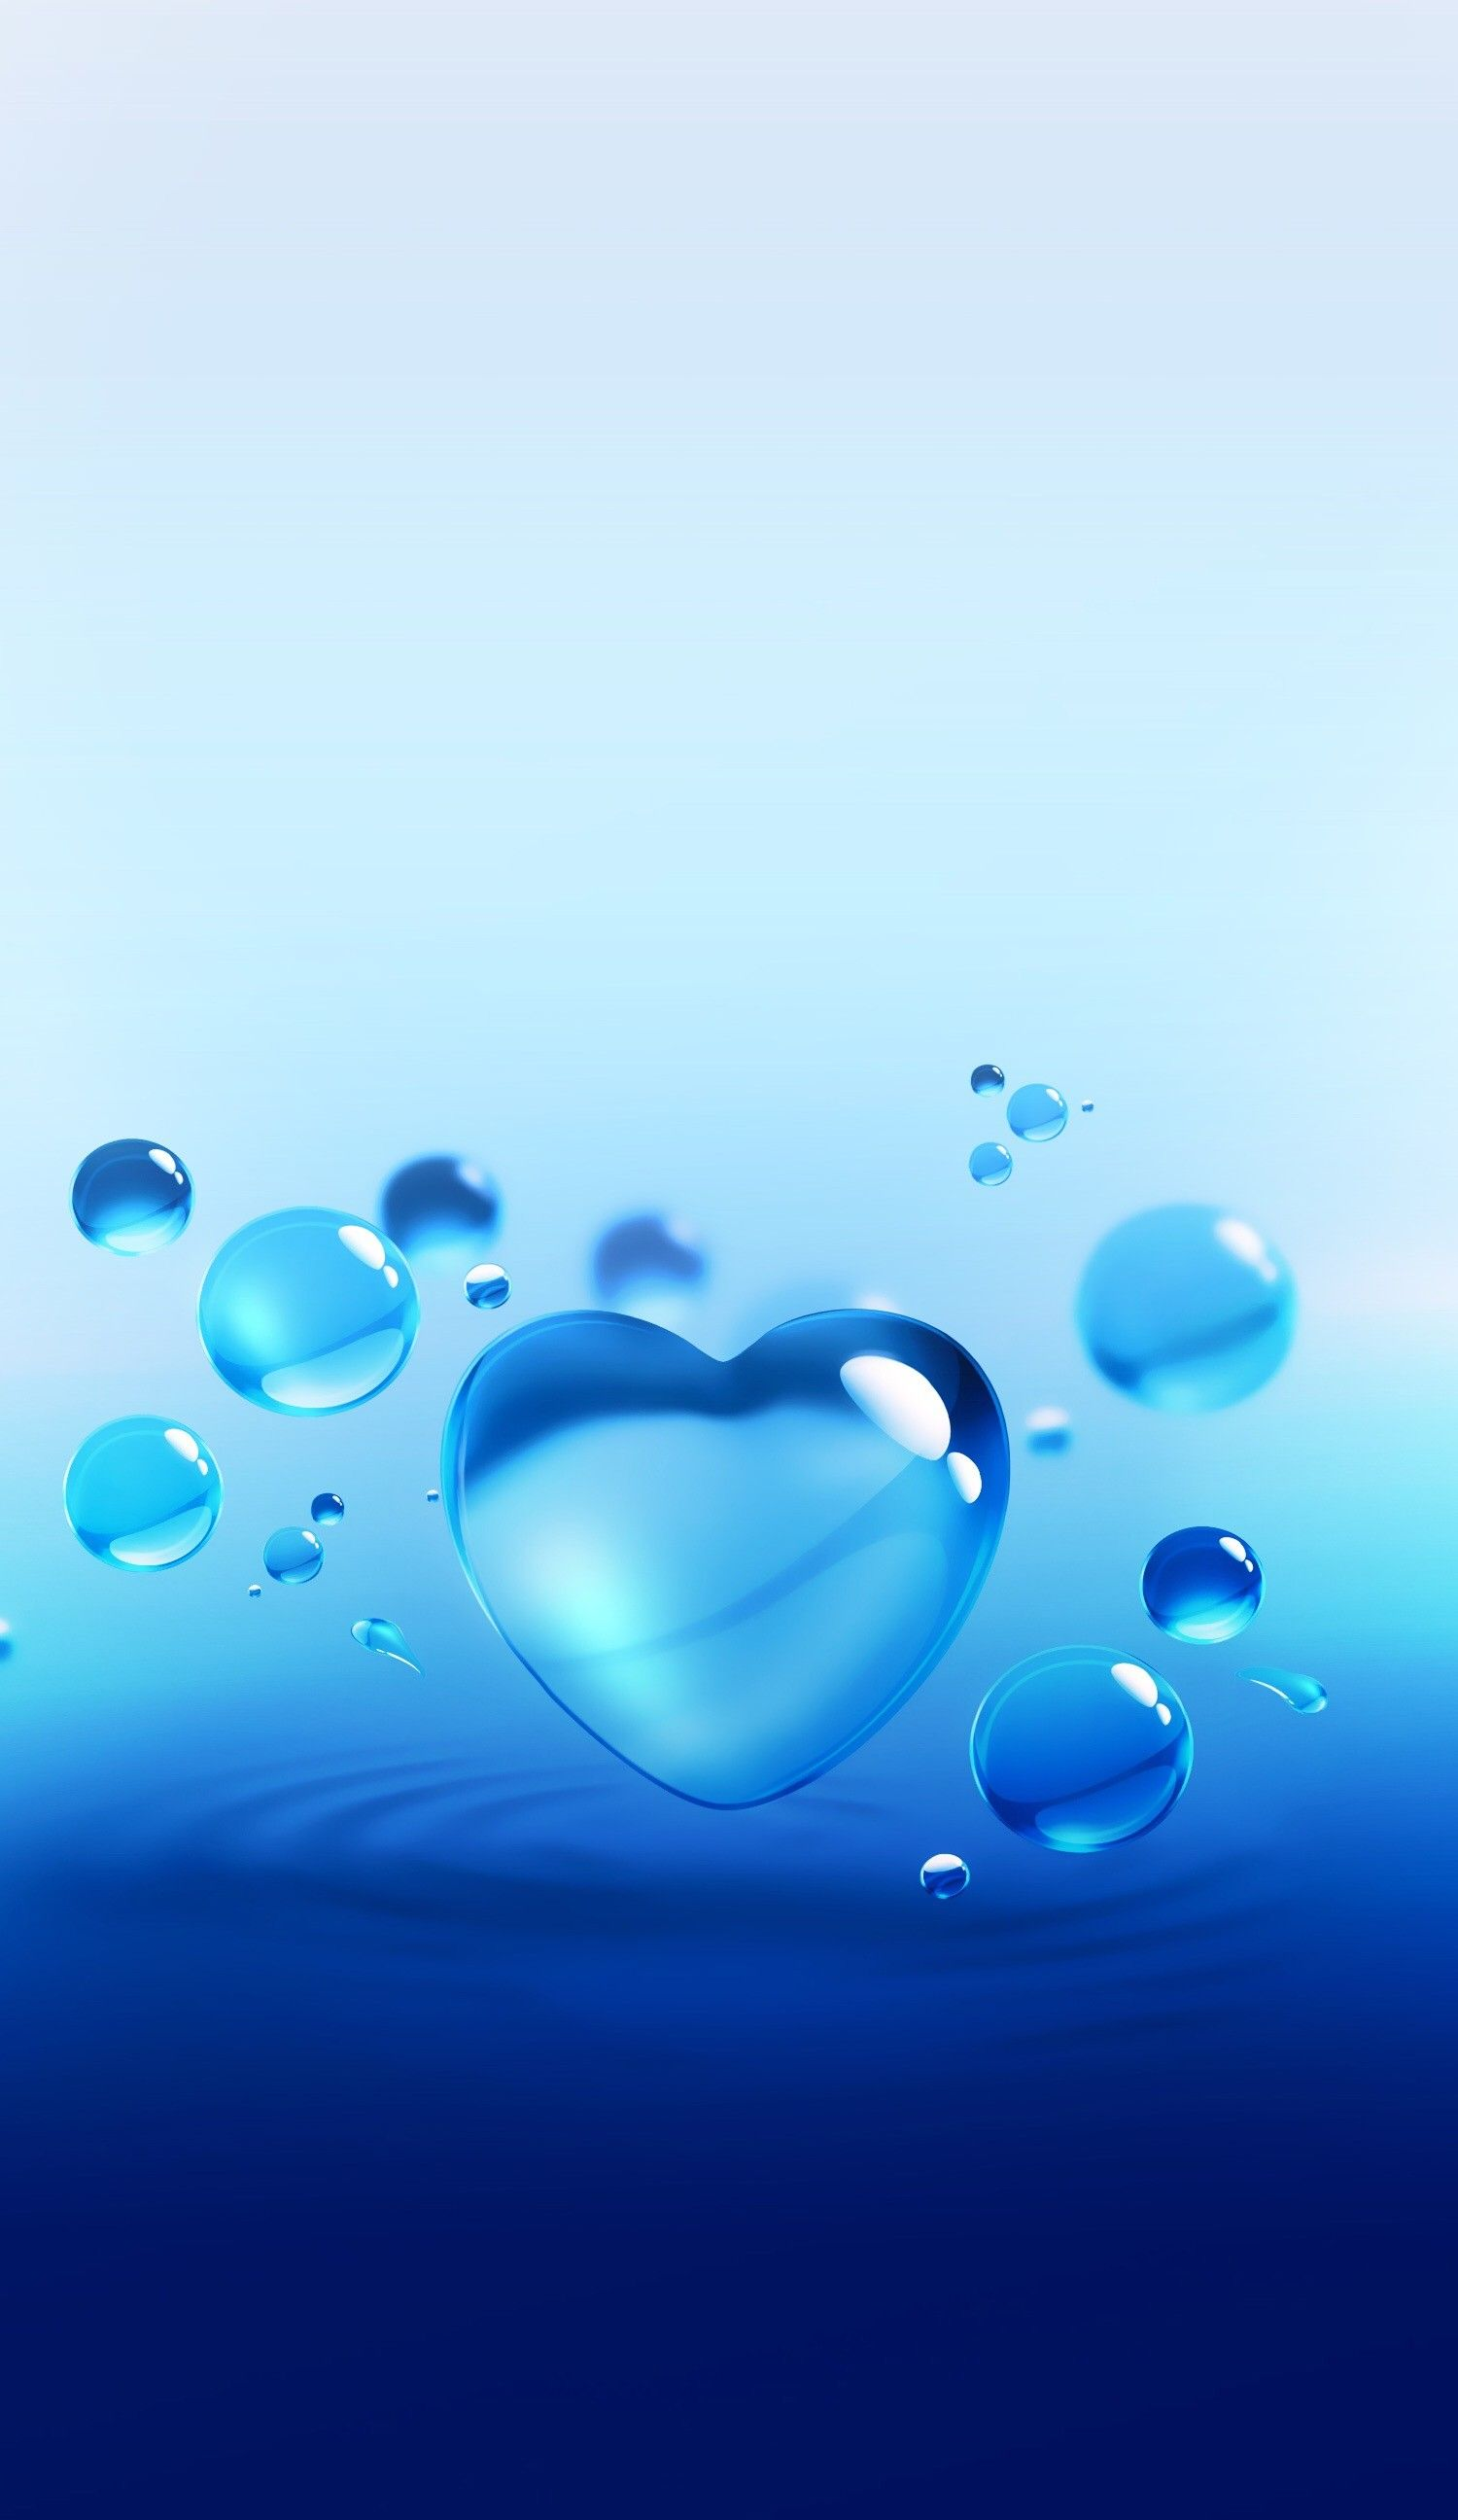 Phone Wallpapers Water Art Beats Rainbows Heart Funds Beads